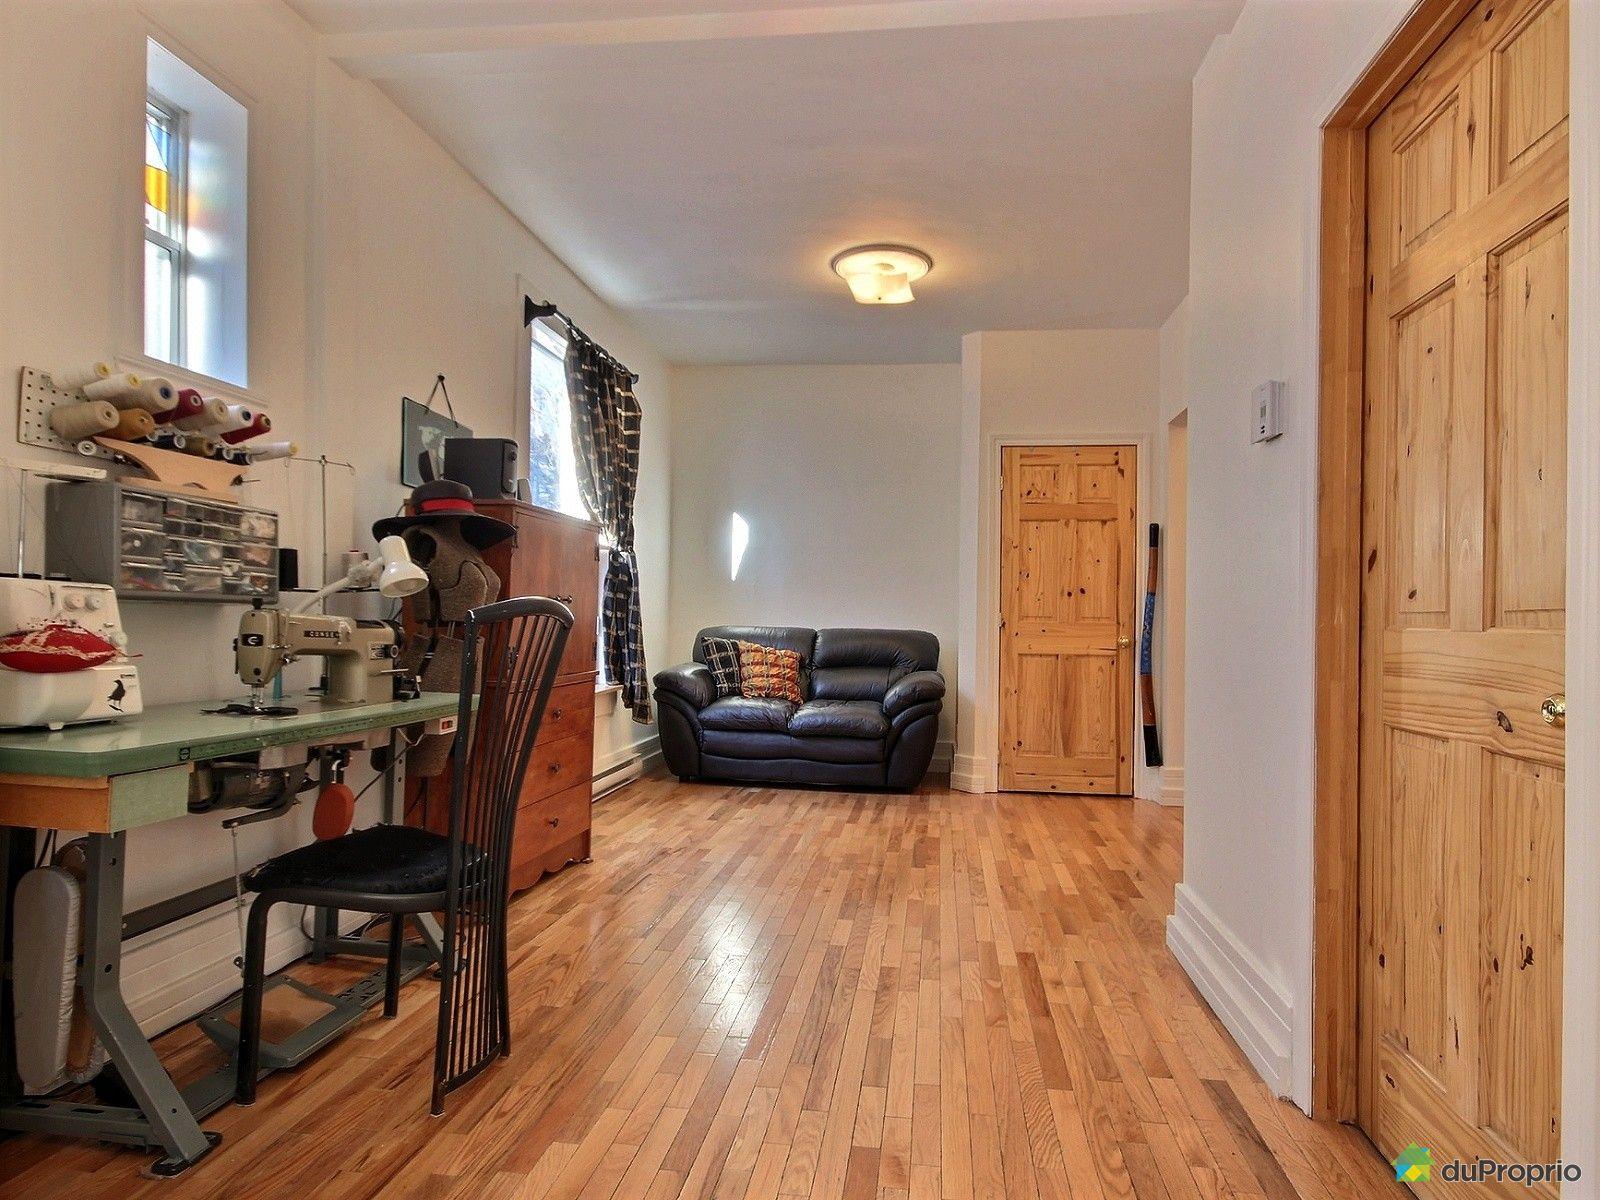 condominium vendre montr al 4730 rue chabot immobilier quebec duproprio 541671. Black Bedroom Furniture Sets. Home Design Ideas